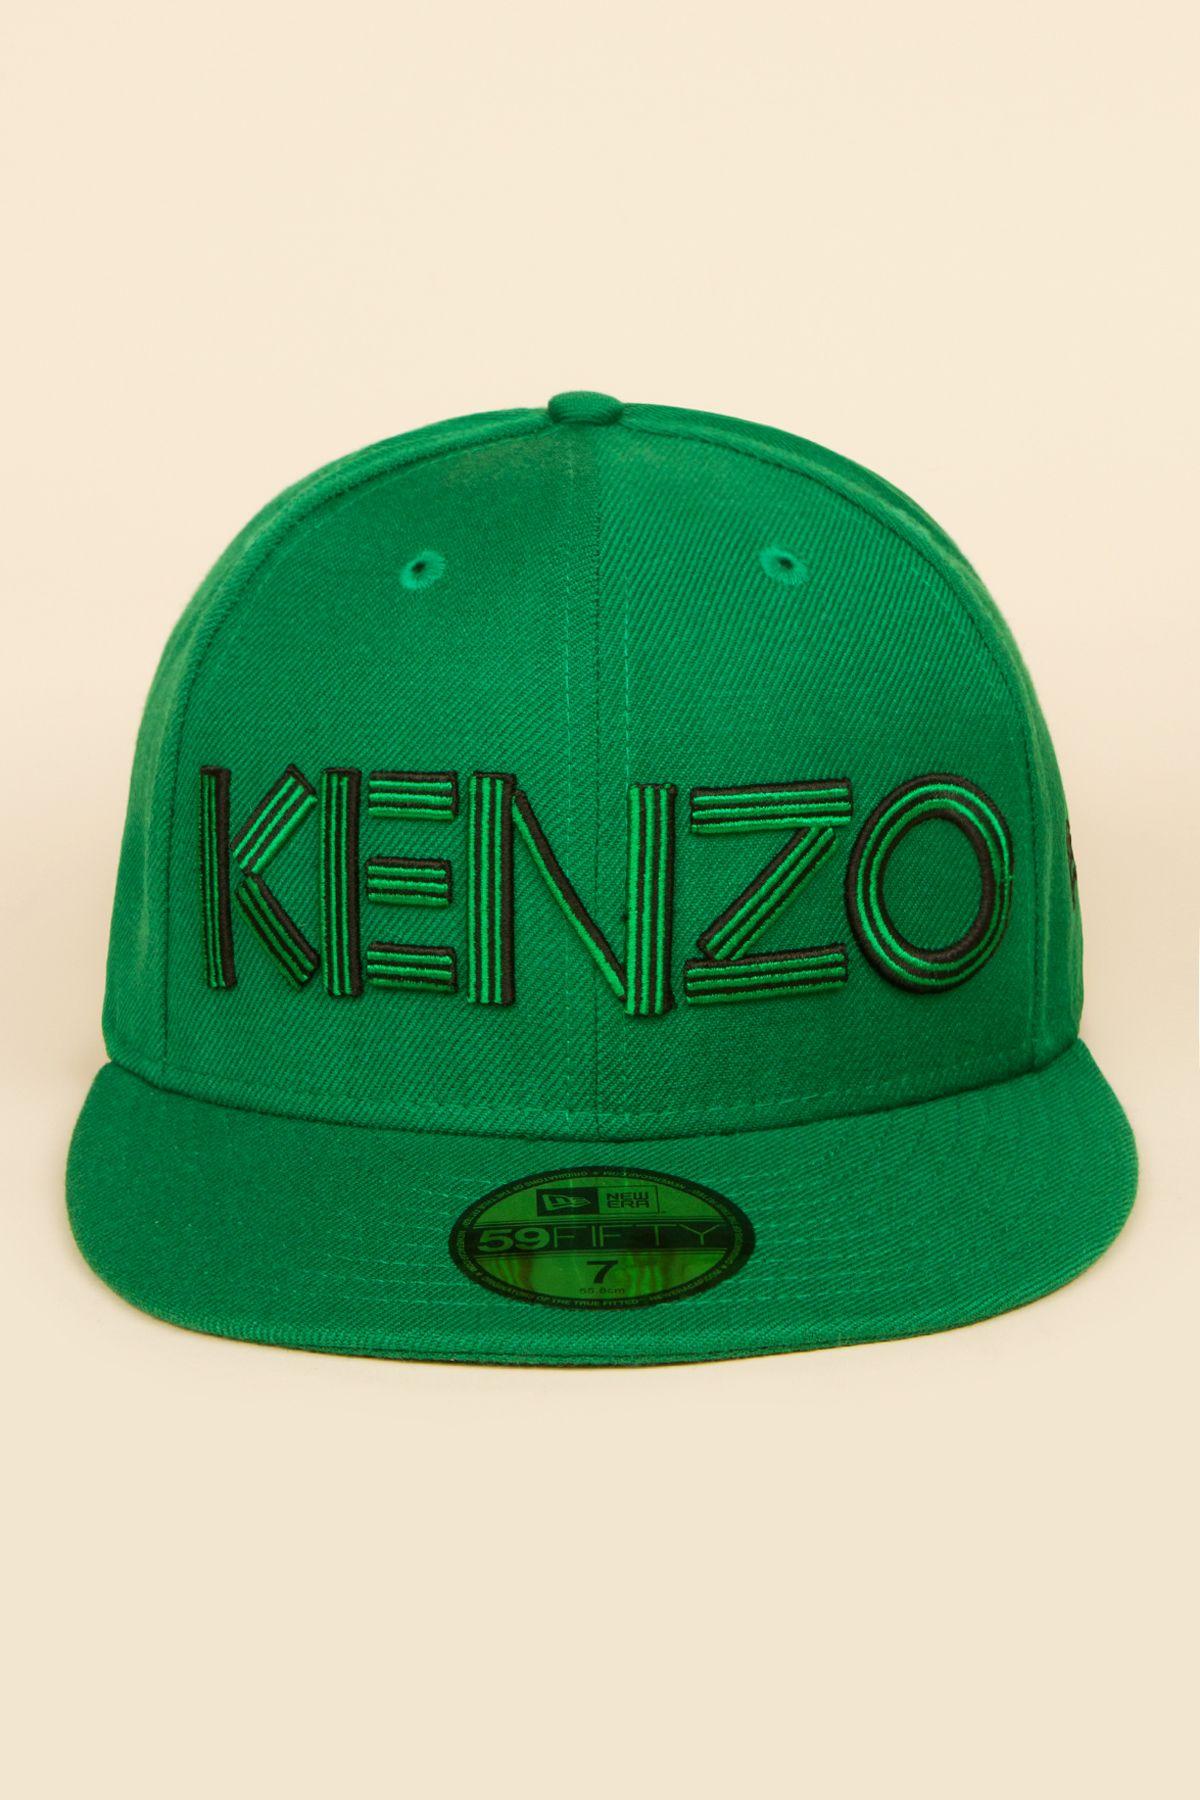 Kenzo x New Era  131b3dfa530